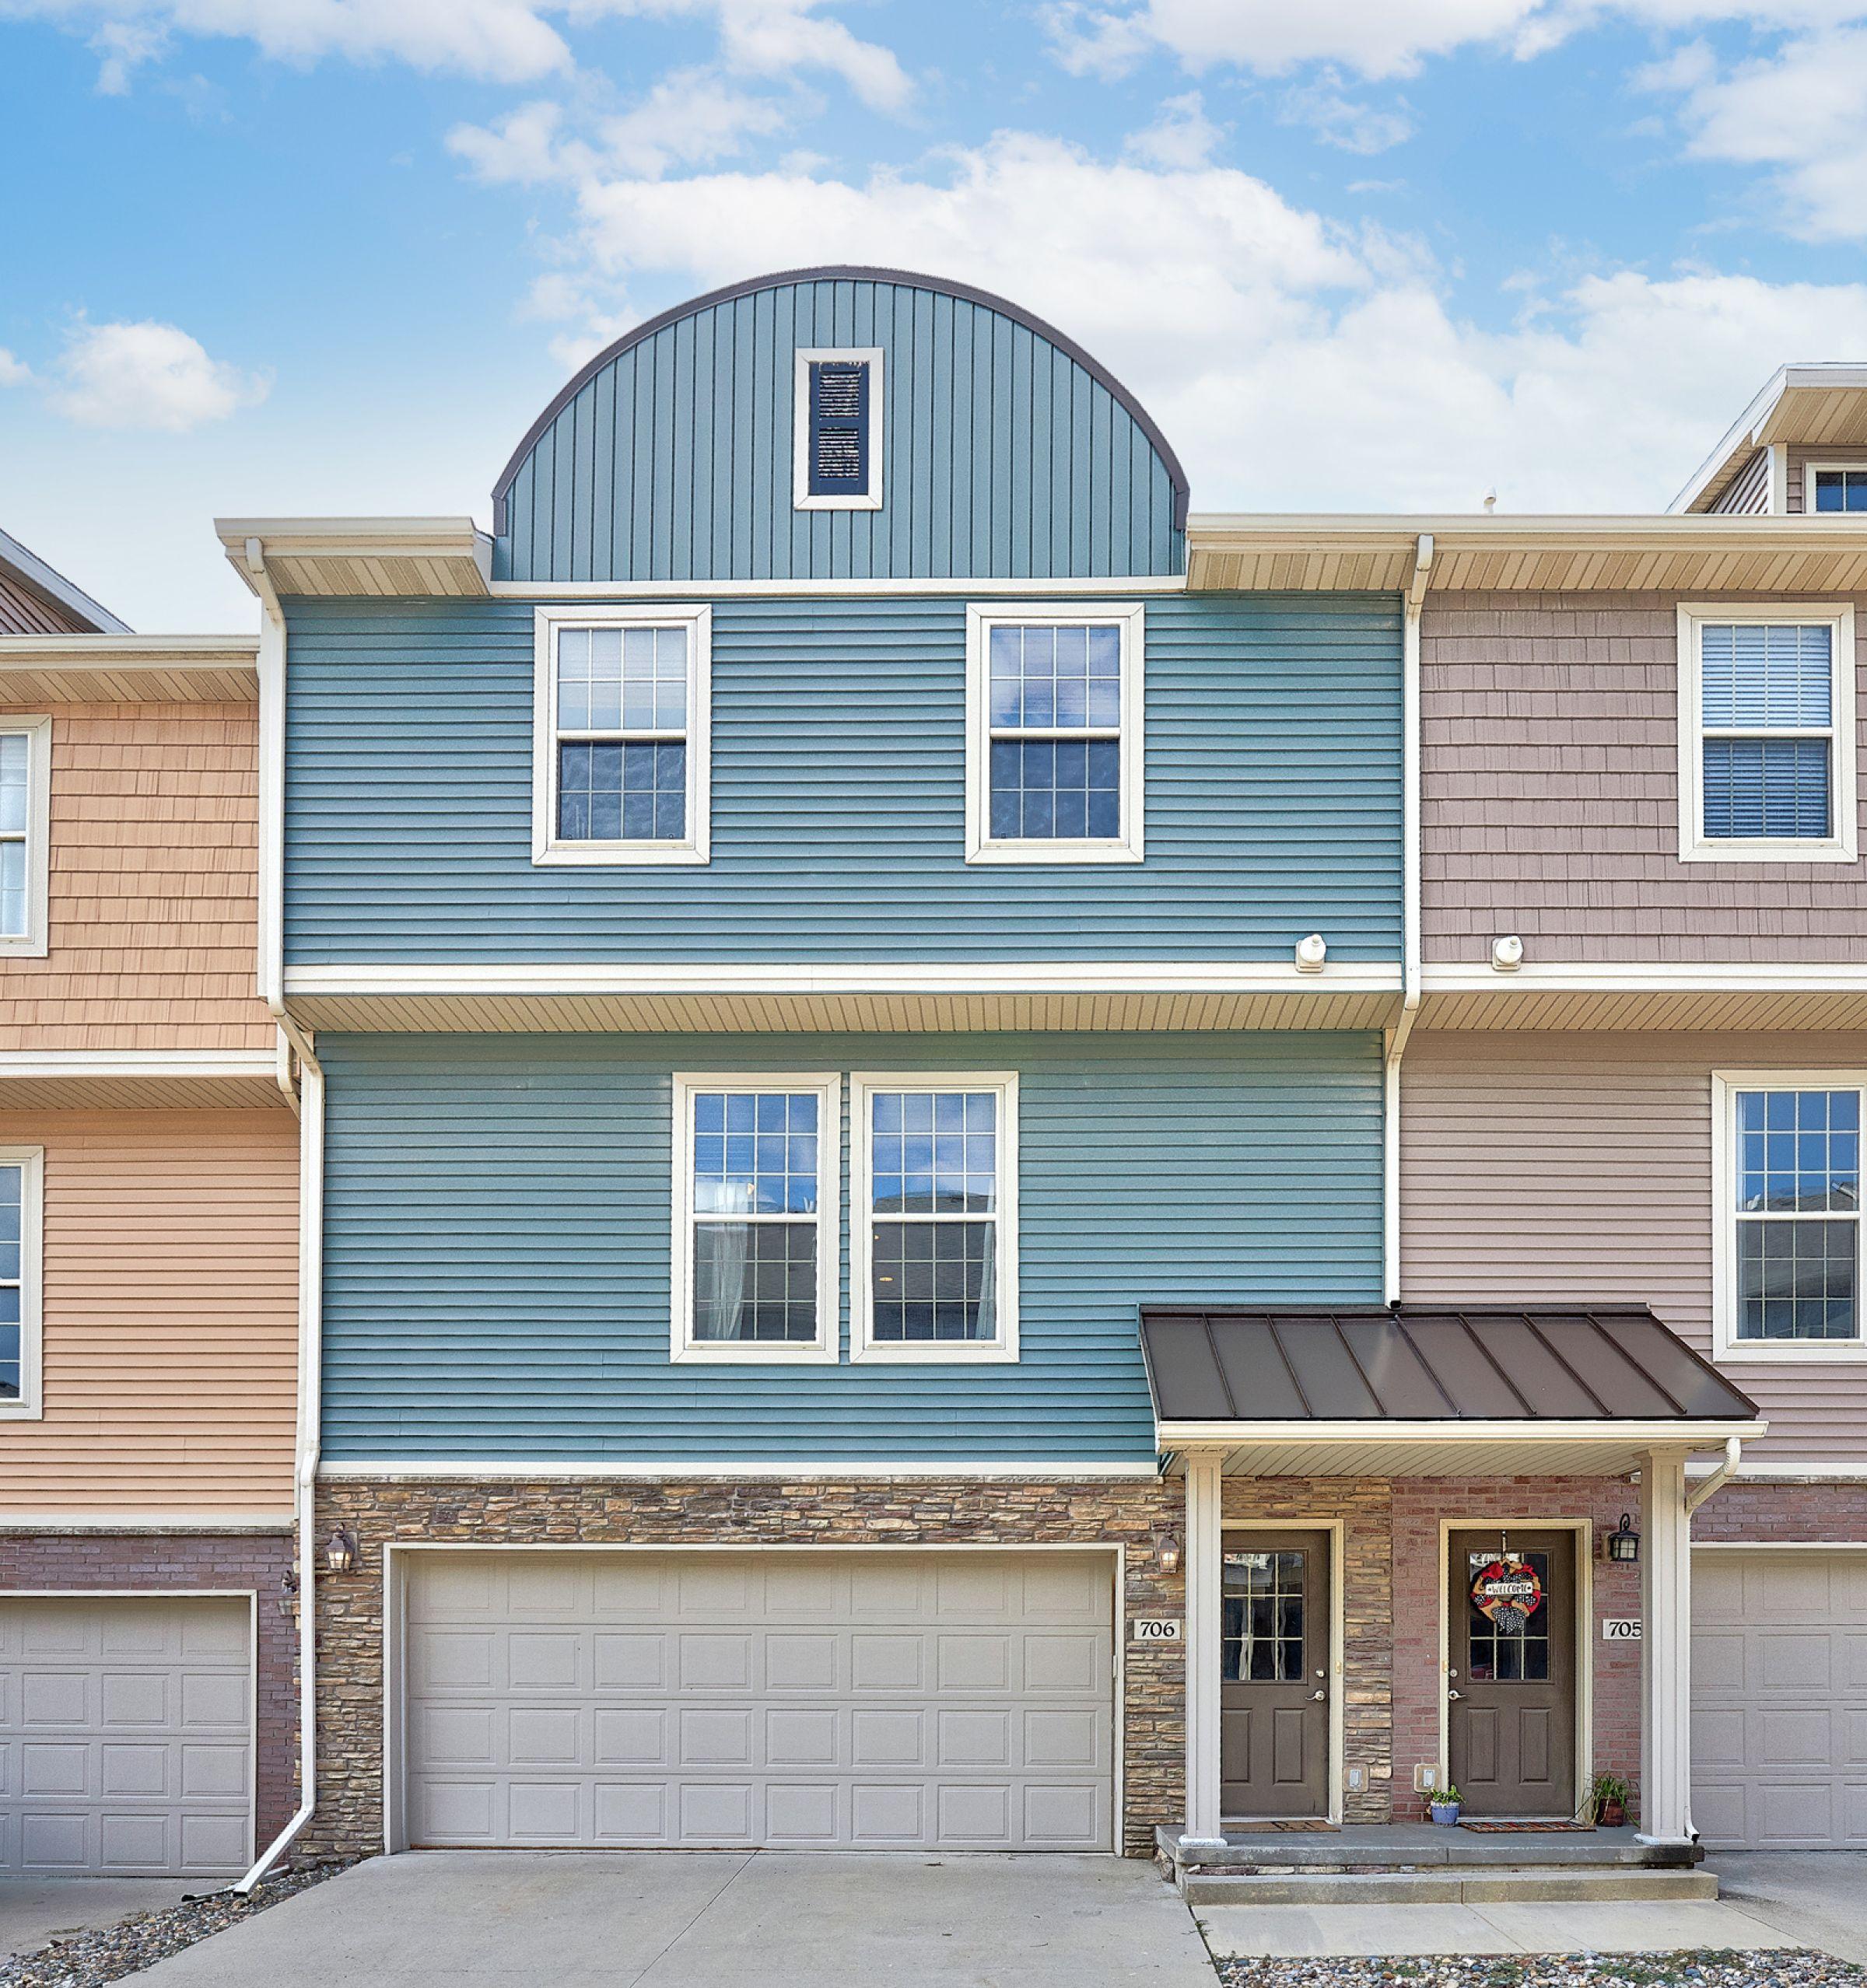 residential-polk-county-iowa-0-acres-listing-number-15662-1-2021-08-03-023301.jpg